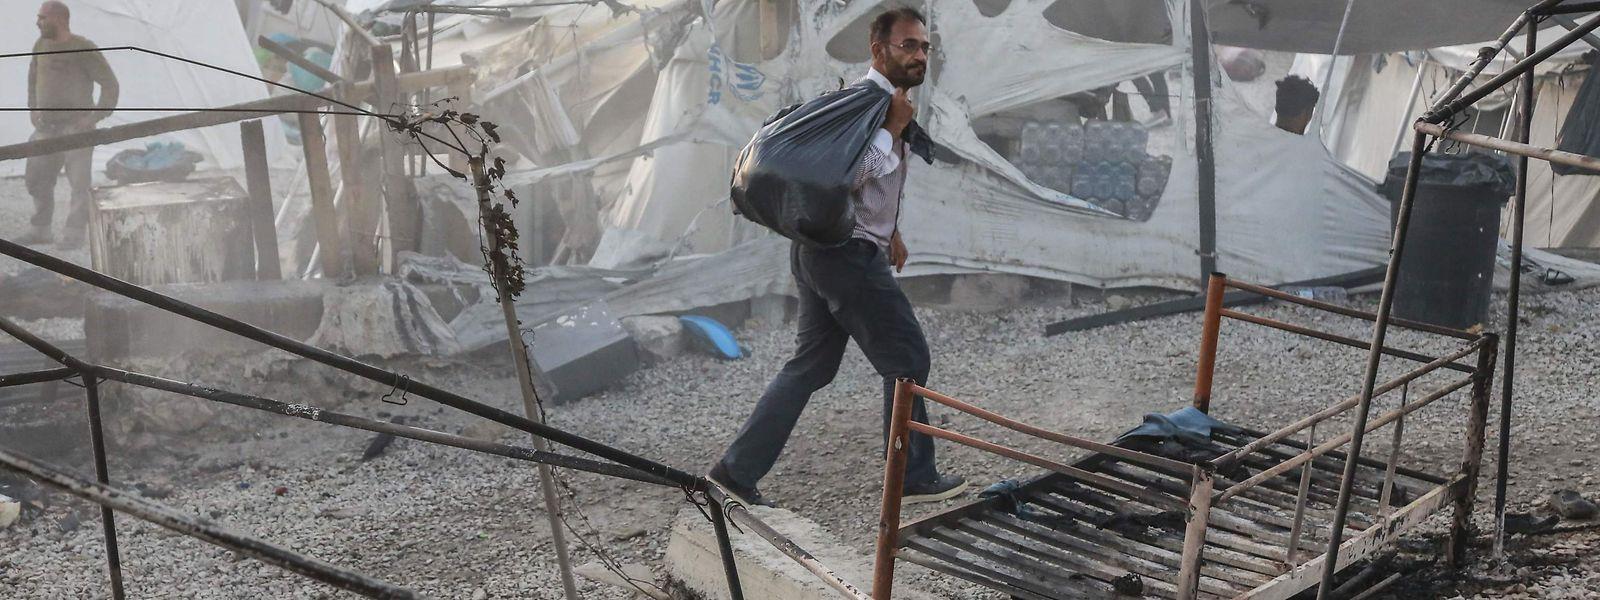 Tausende Flüchtlinge sind nach dem Feuer im Lager Moria nun obdachlos.